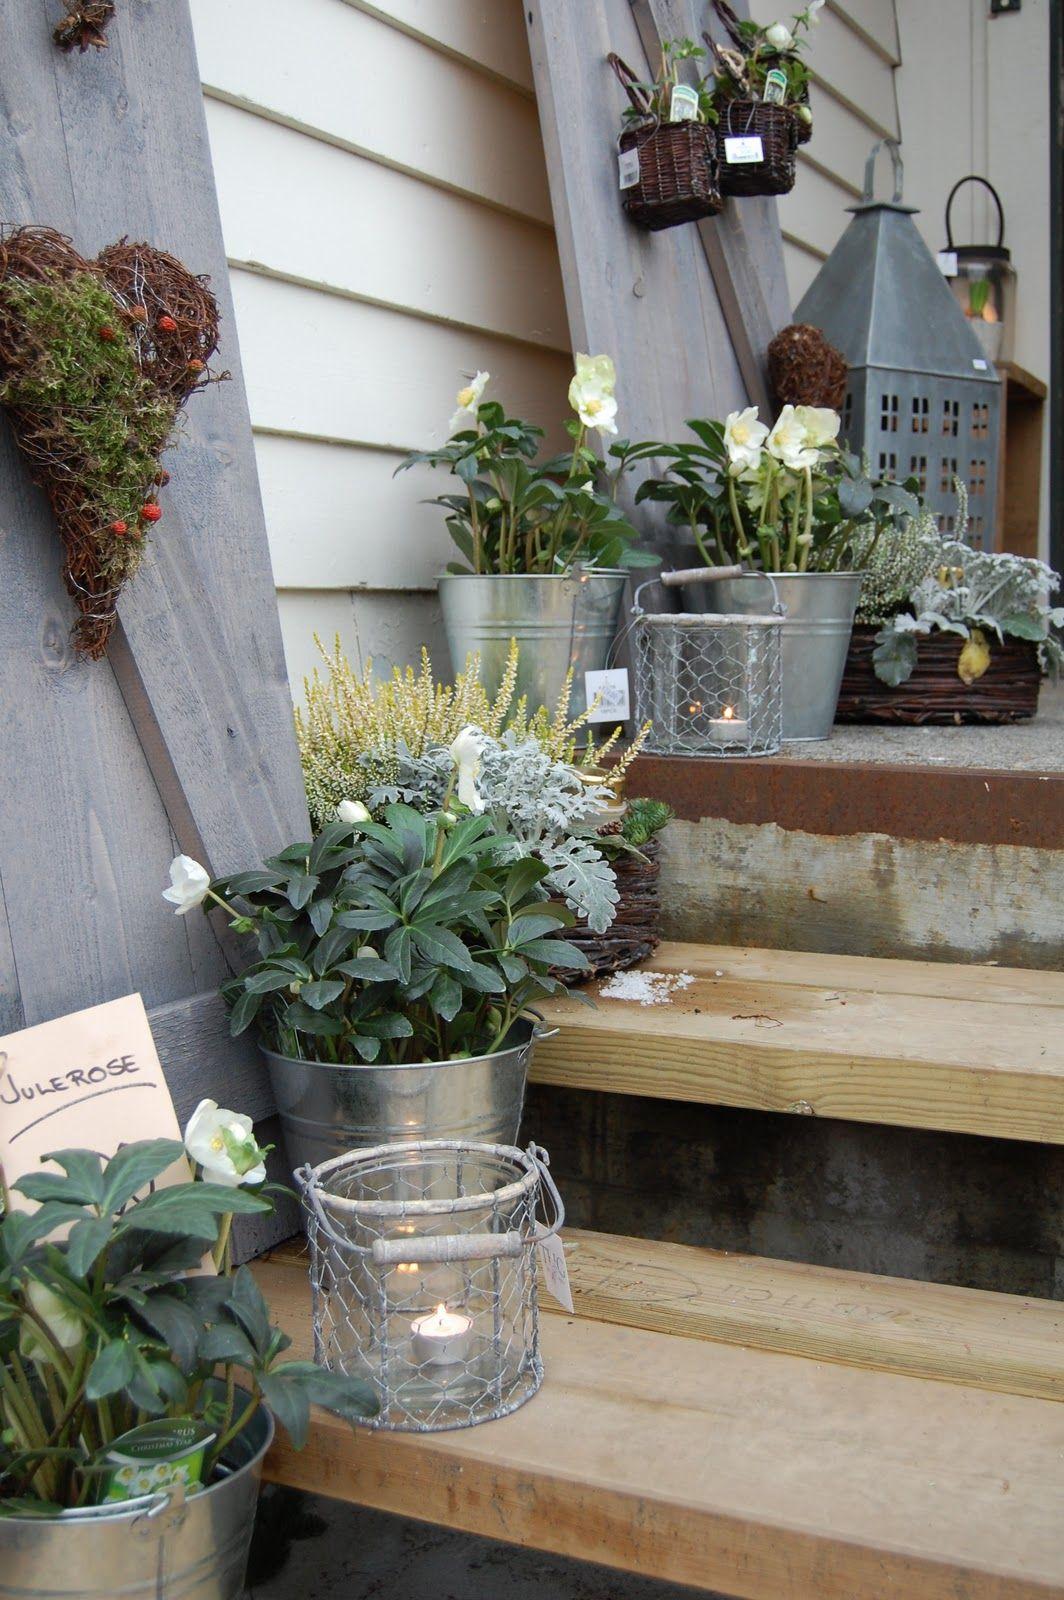 Anemone haust r eingang pinterest garten garten - Hangepflanzen garten ...